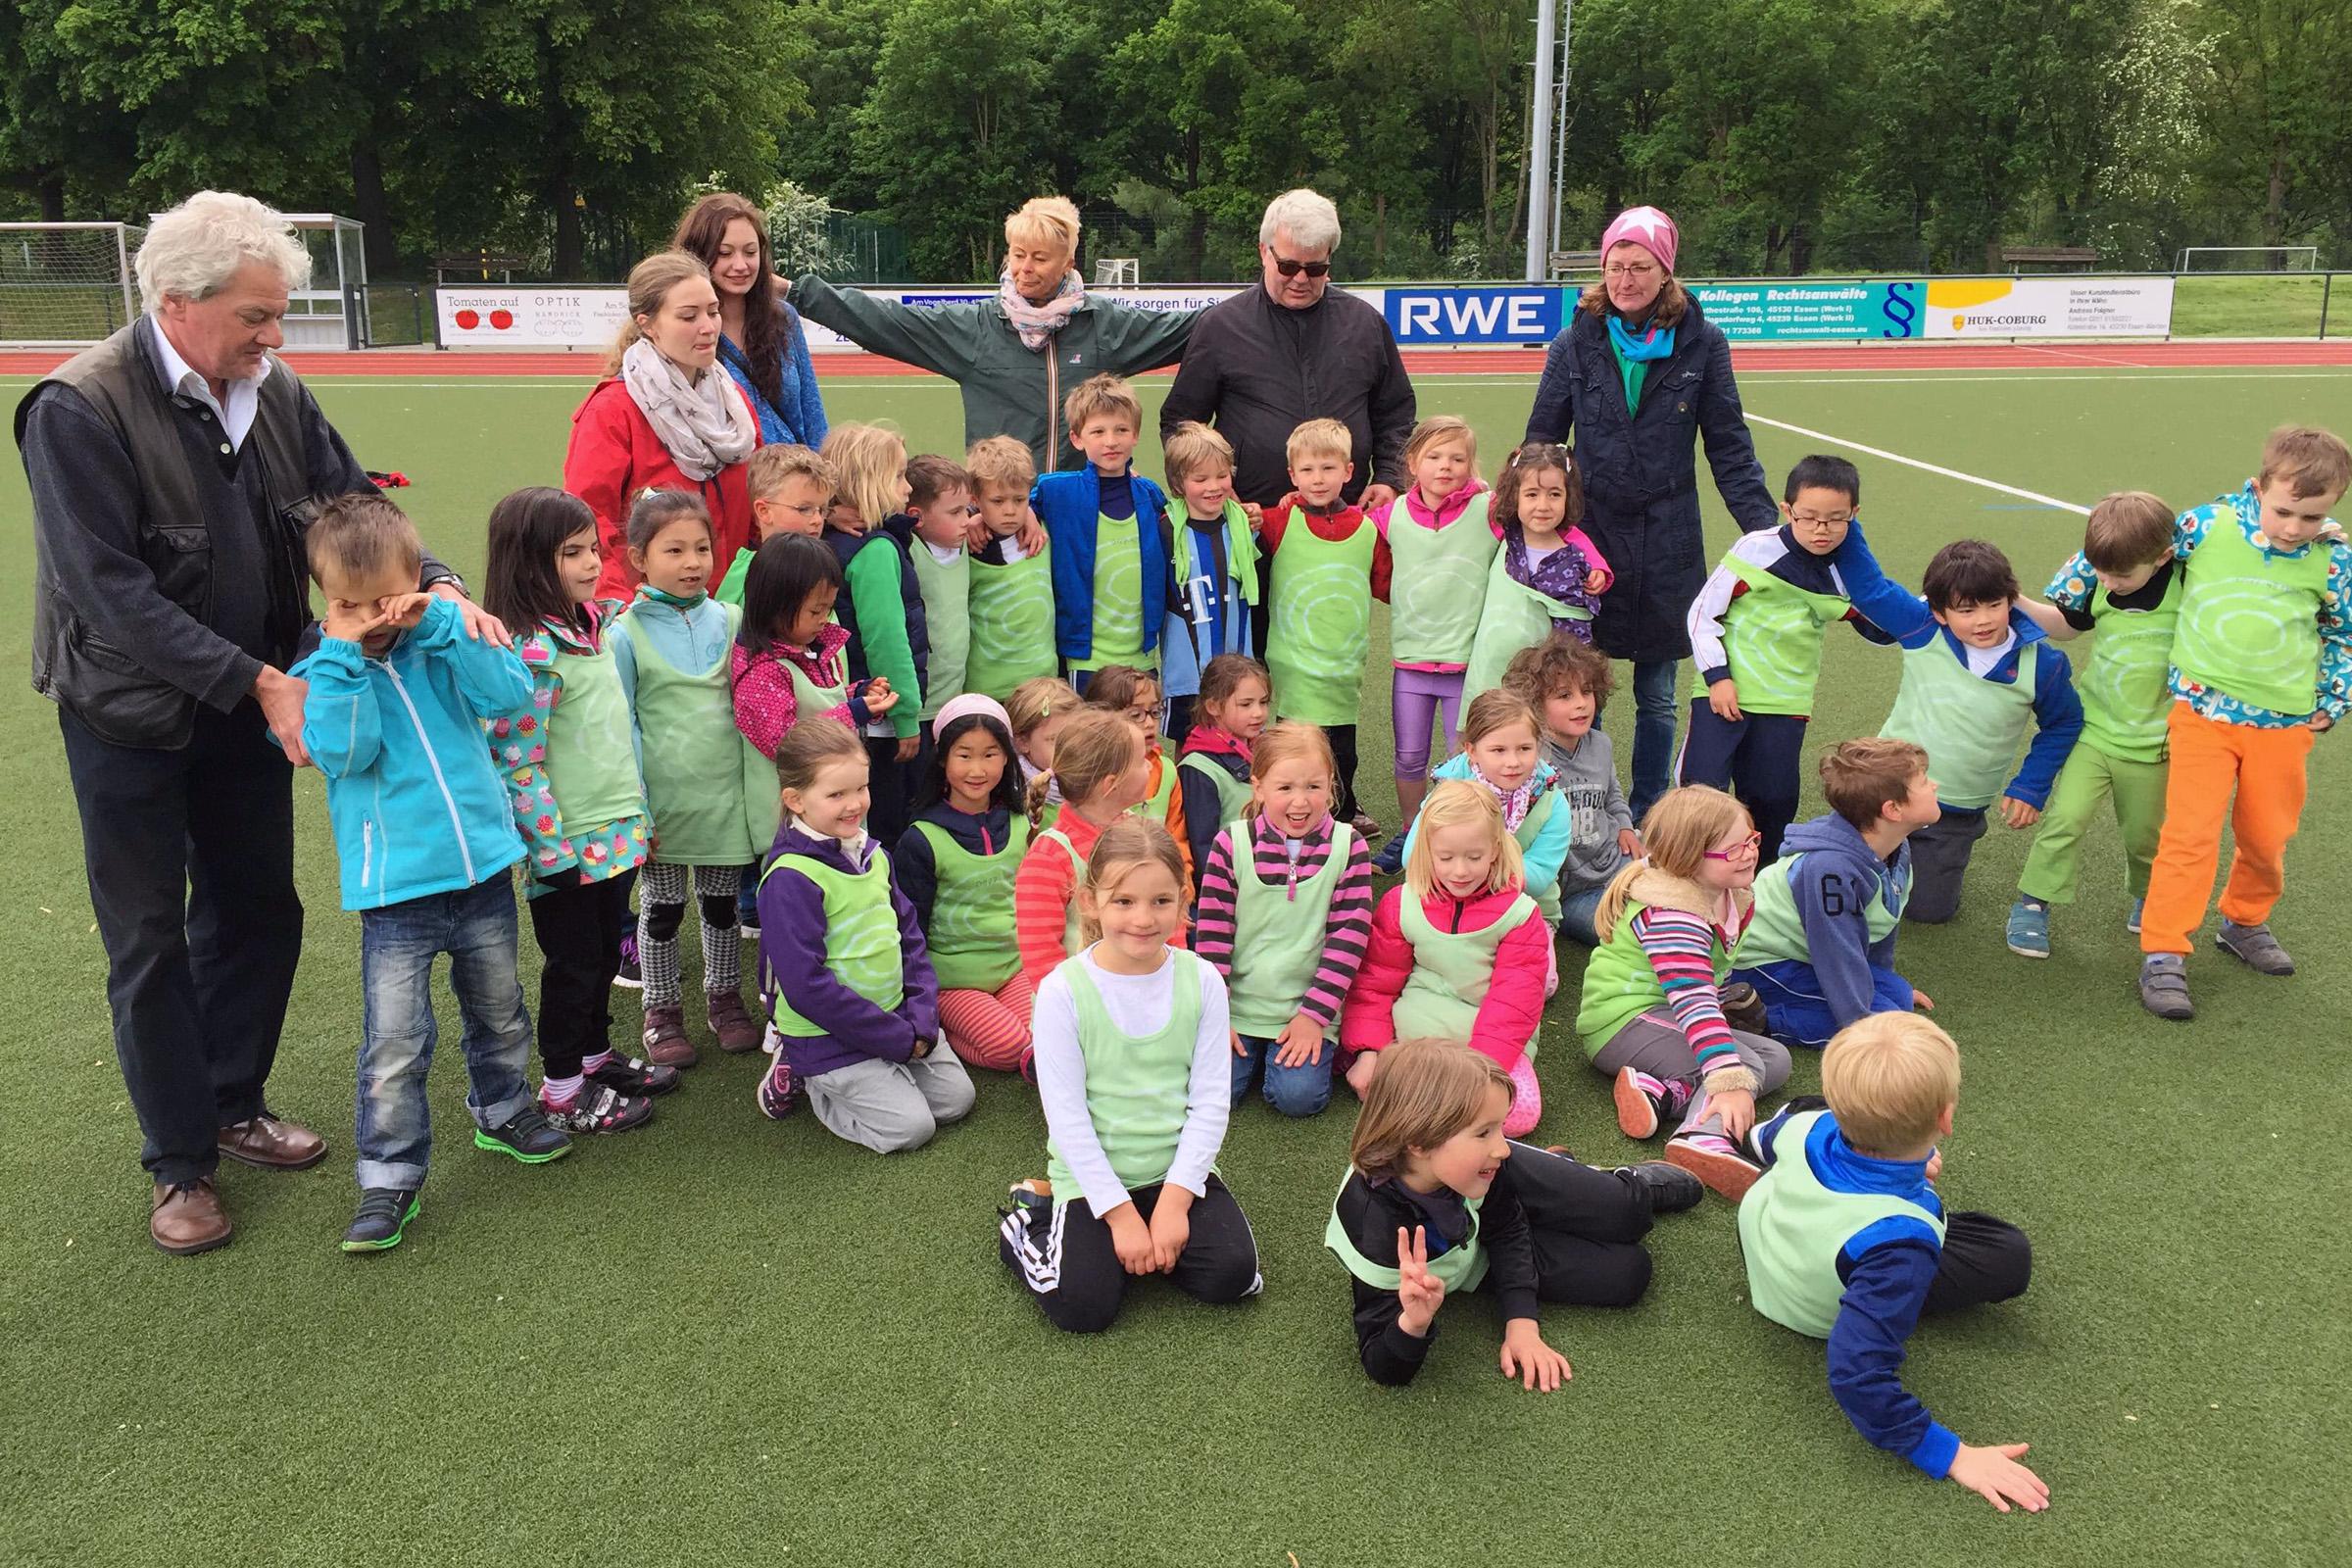 20150519_KitaLummerland_Sportabzeichen_01.JPG